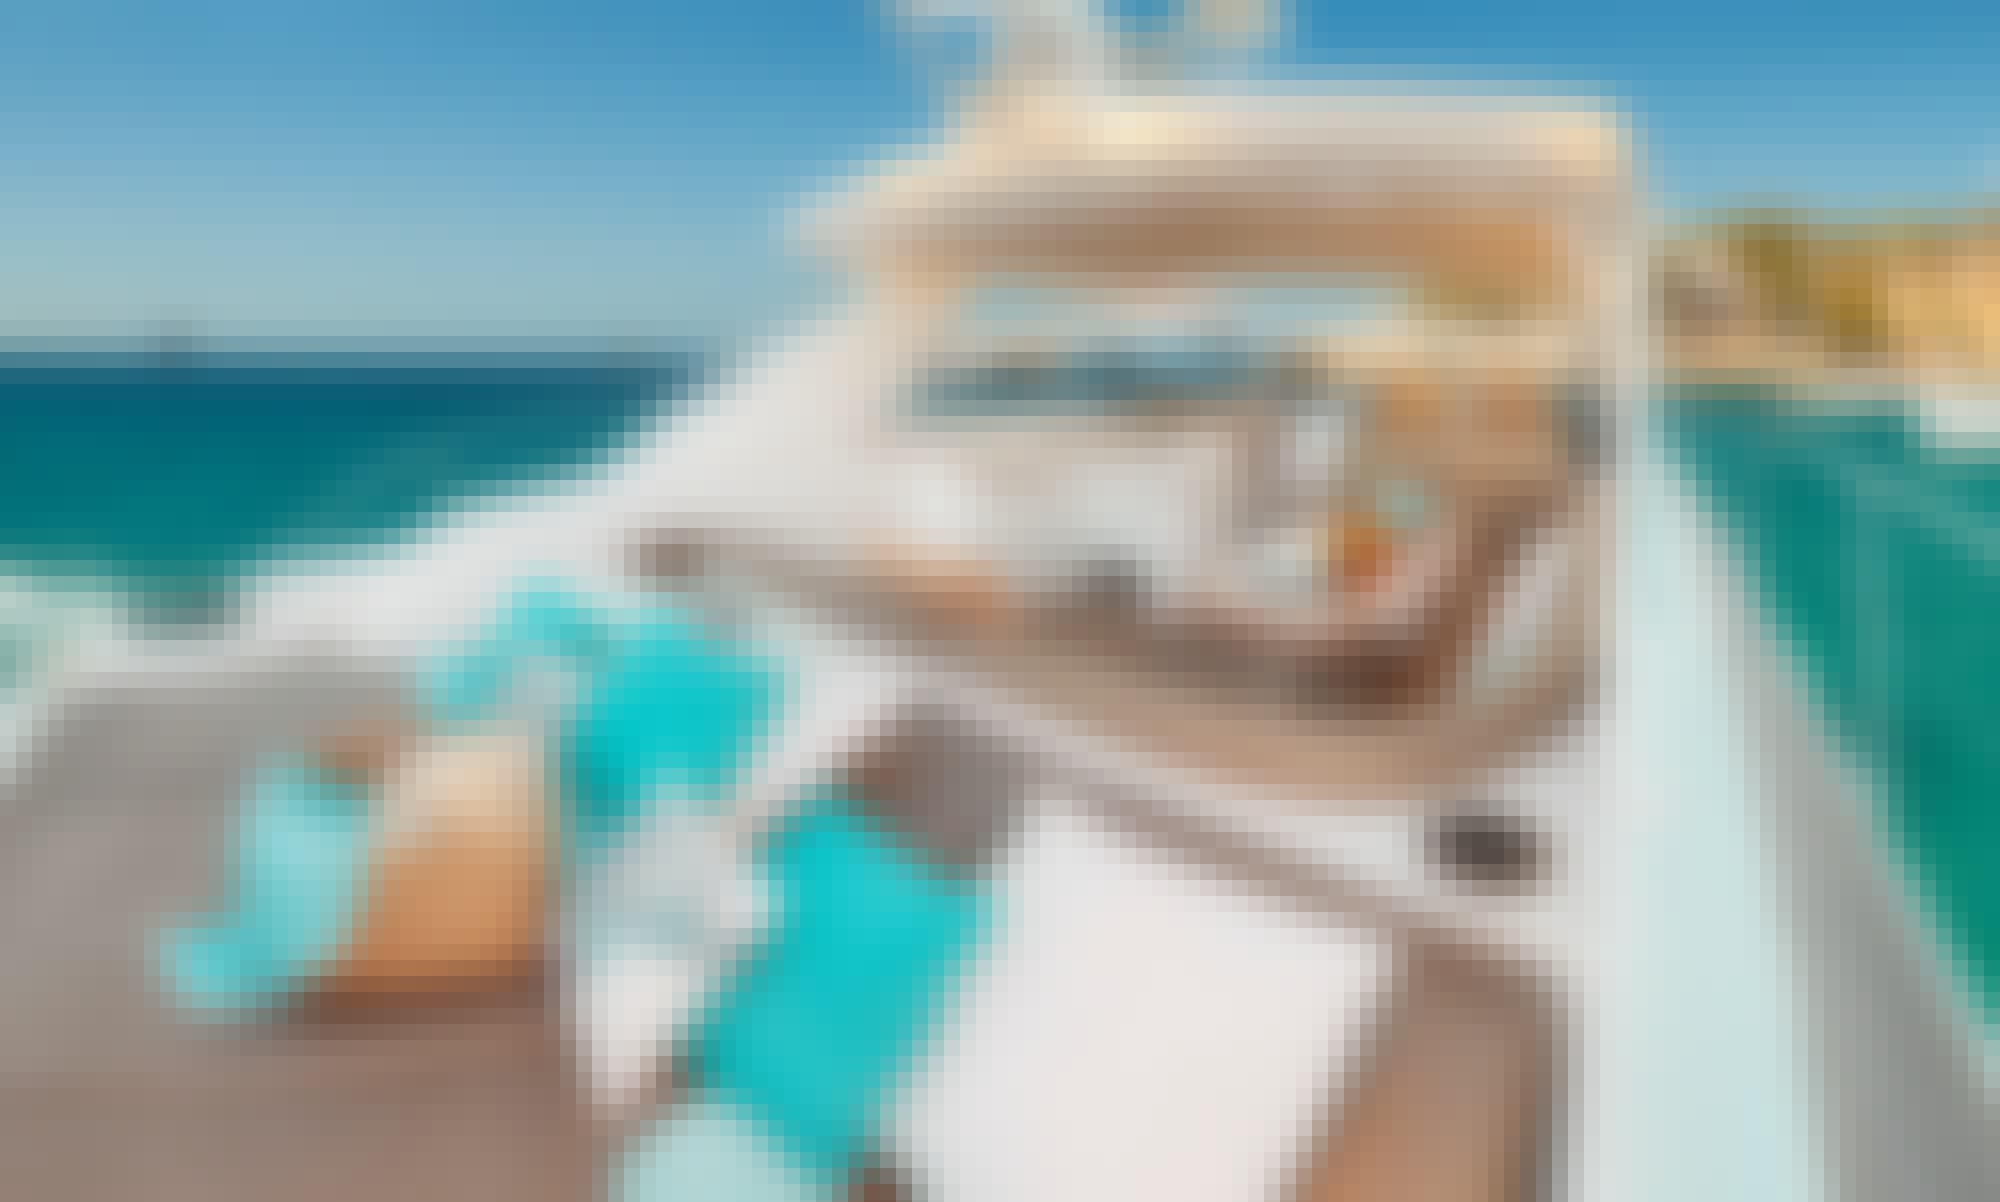 12-People Princess V58 Motor Yacht Charter in Ibiza, Spain